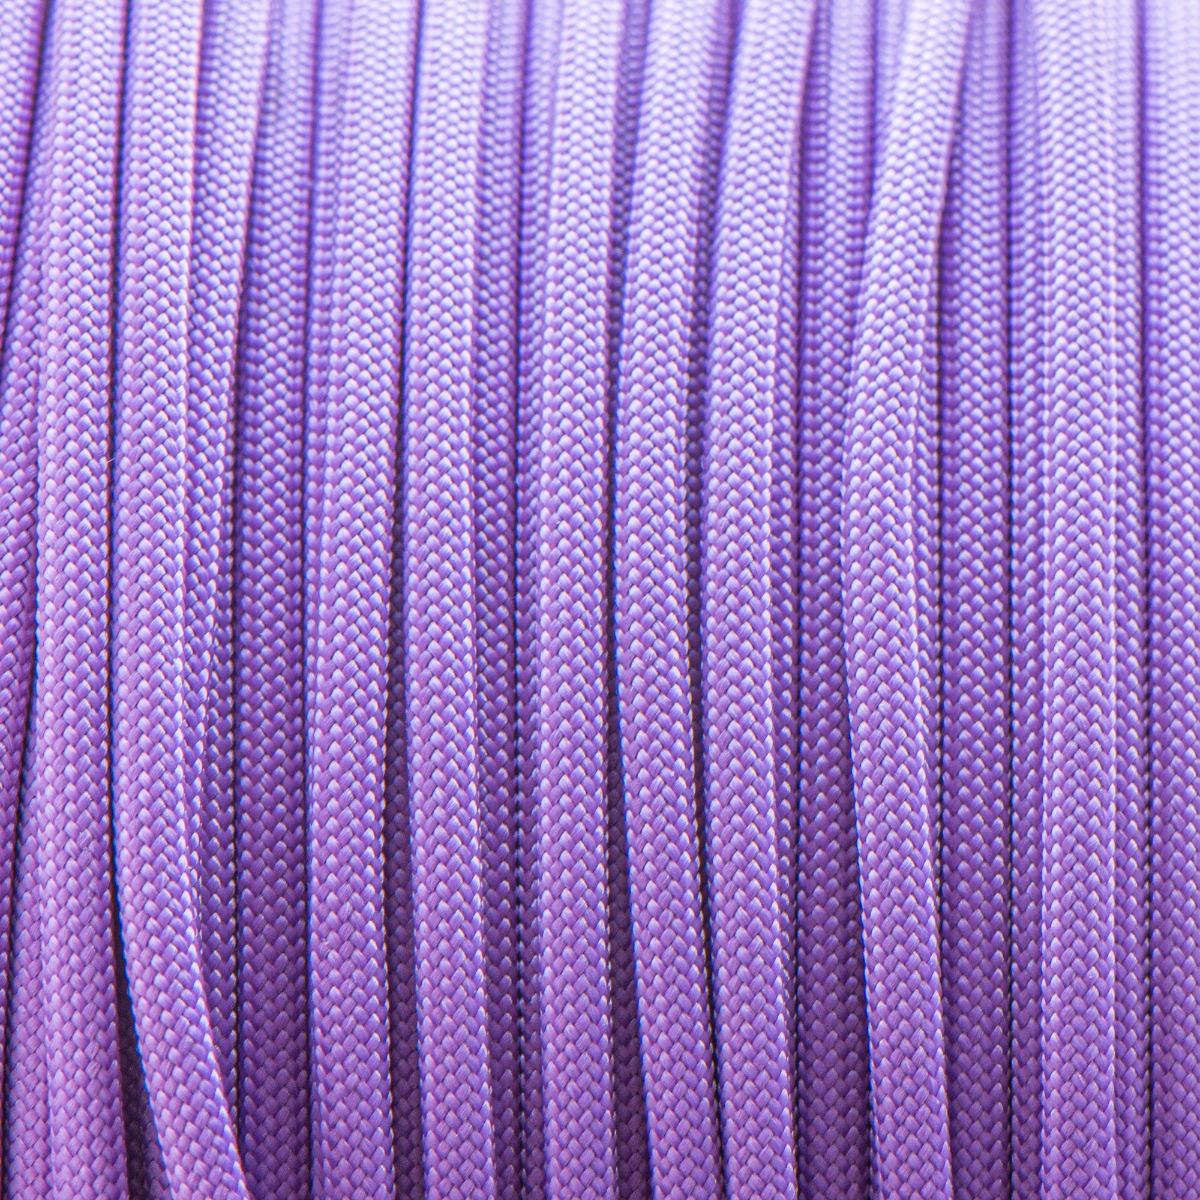 Pastel Purple Paracord Type III